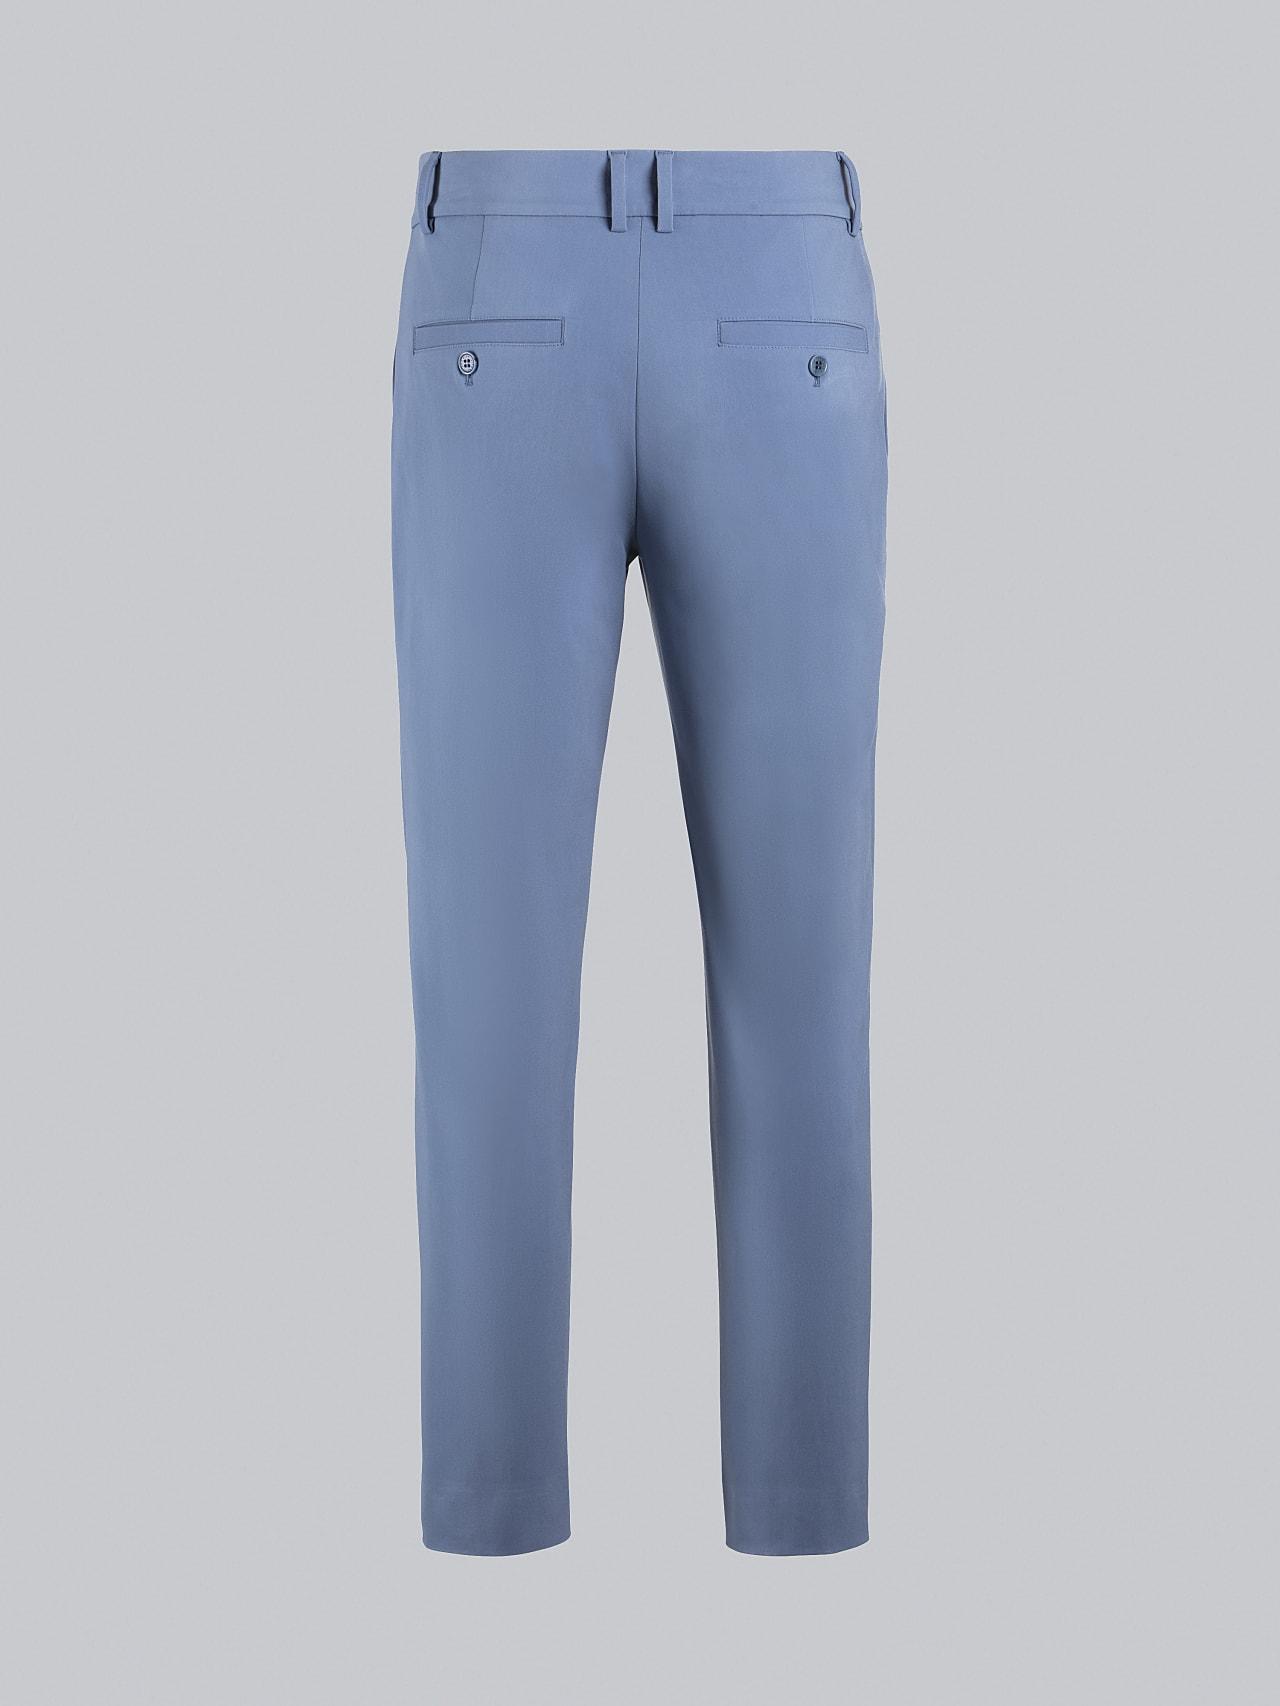 PELAN V1.Y5.02 Tapered Pants with Pleats light blue Left Alpha Tauri